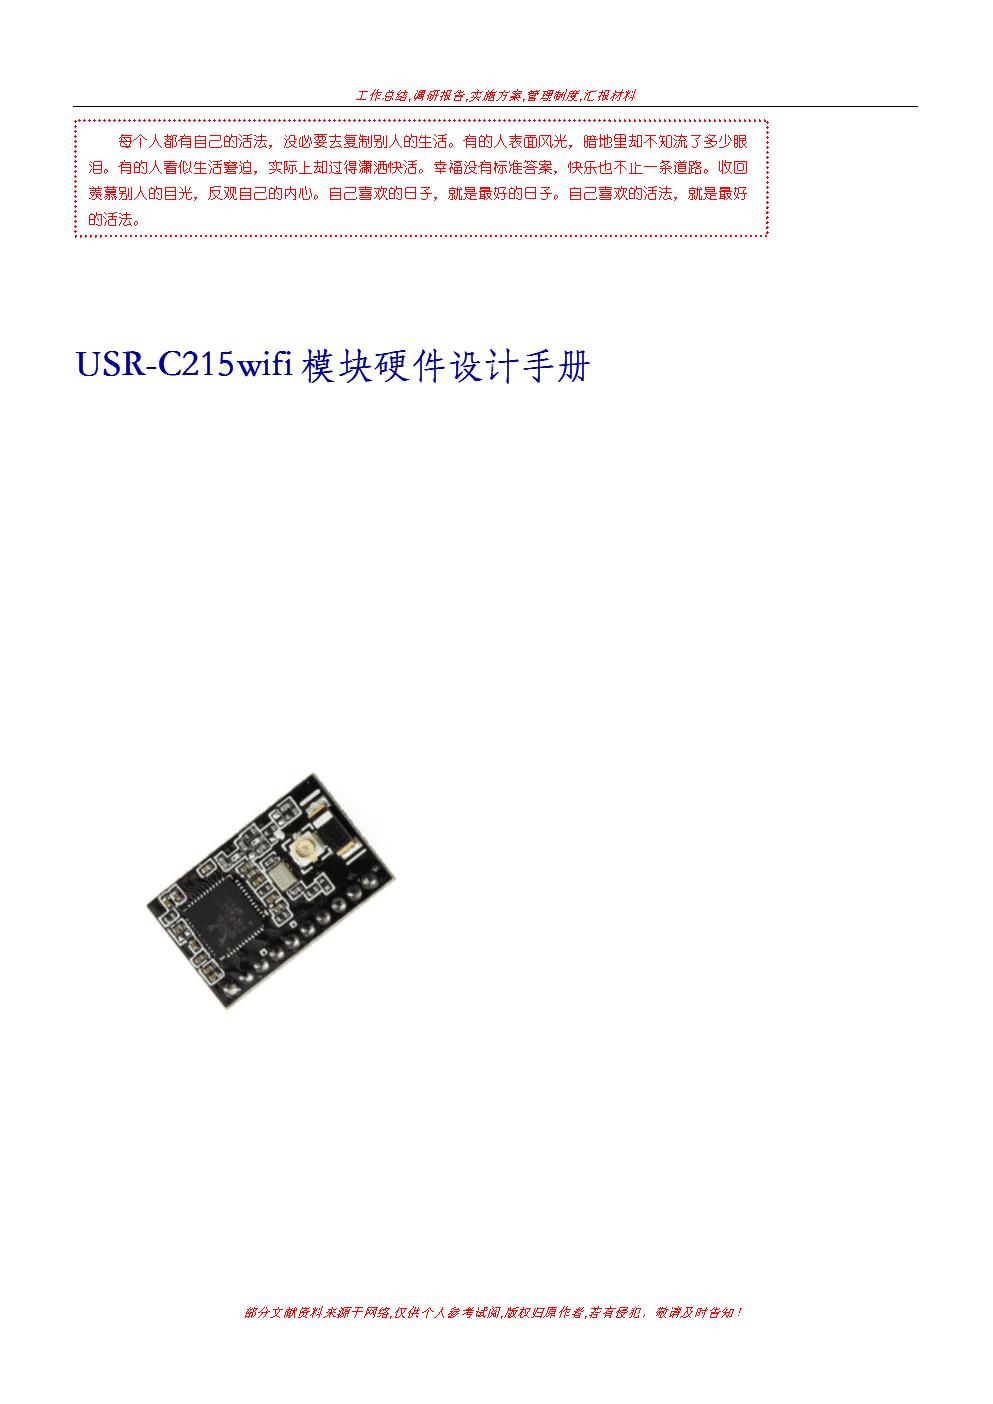 USRC215wifi模块硬件设计手册.doc